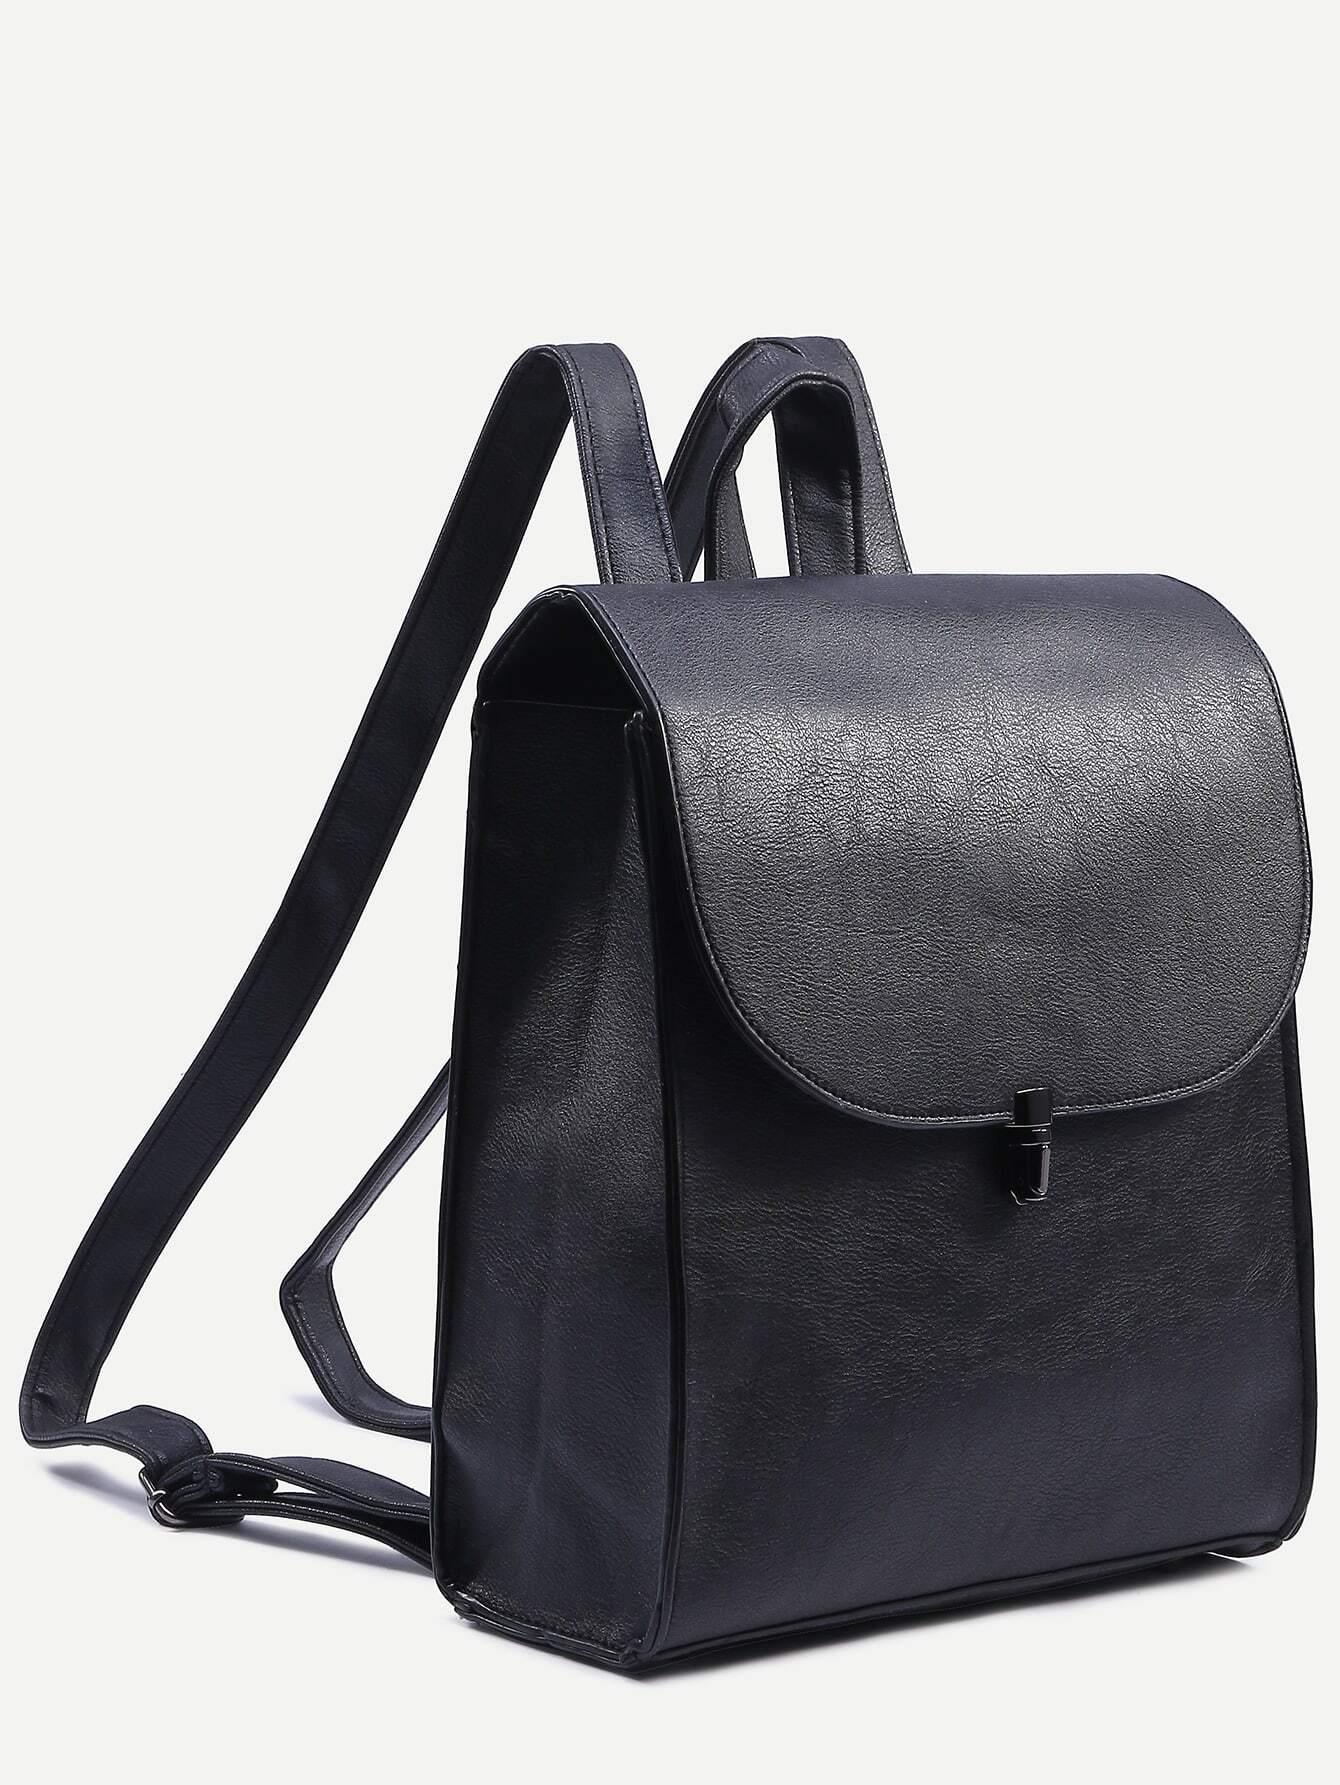 bag160804901_2